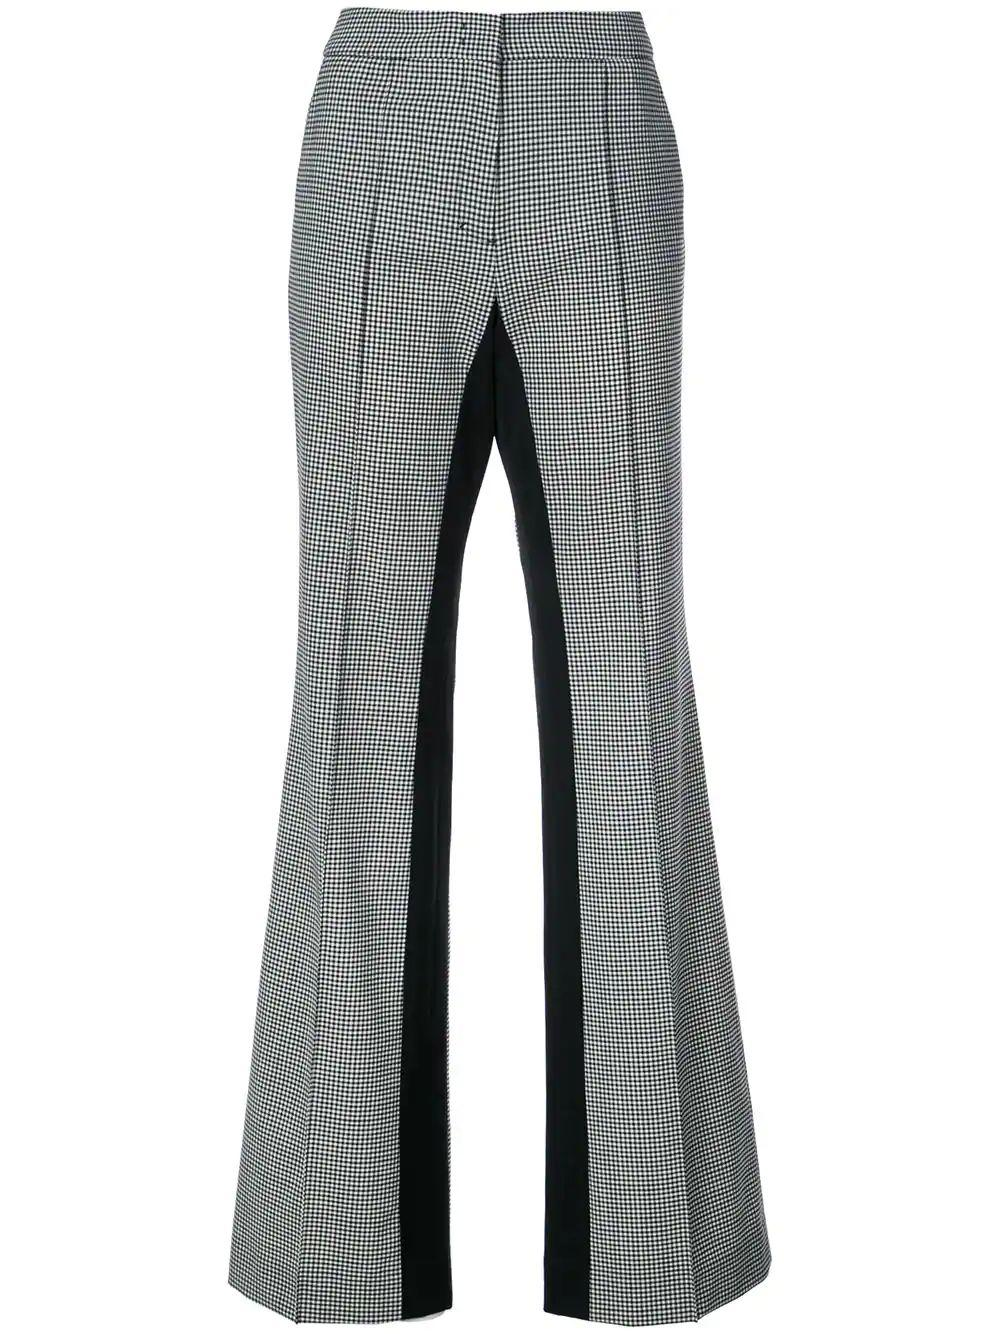 Minimal Vichy Loose Straight Leg Pant Item # 191-340803